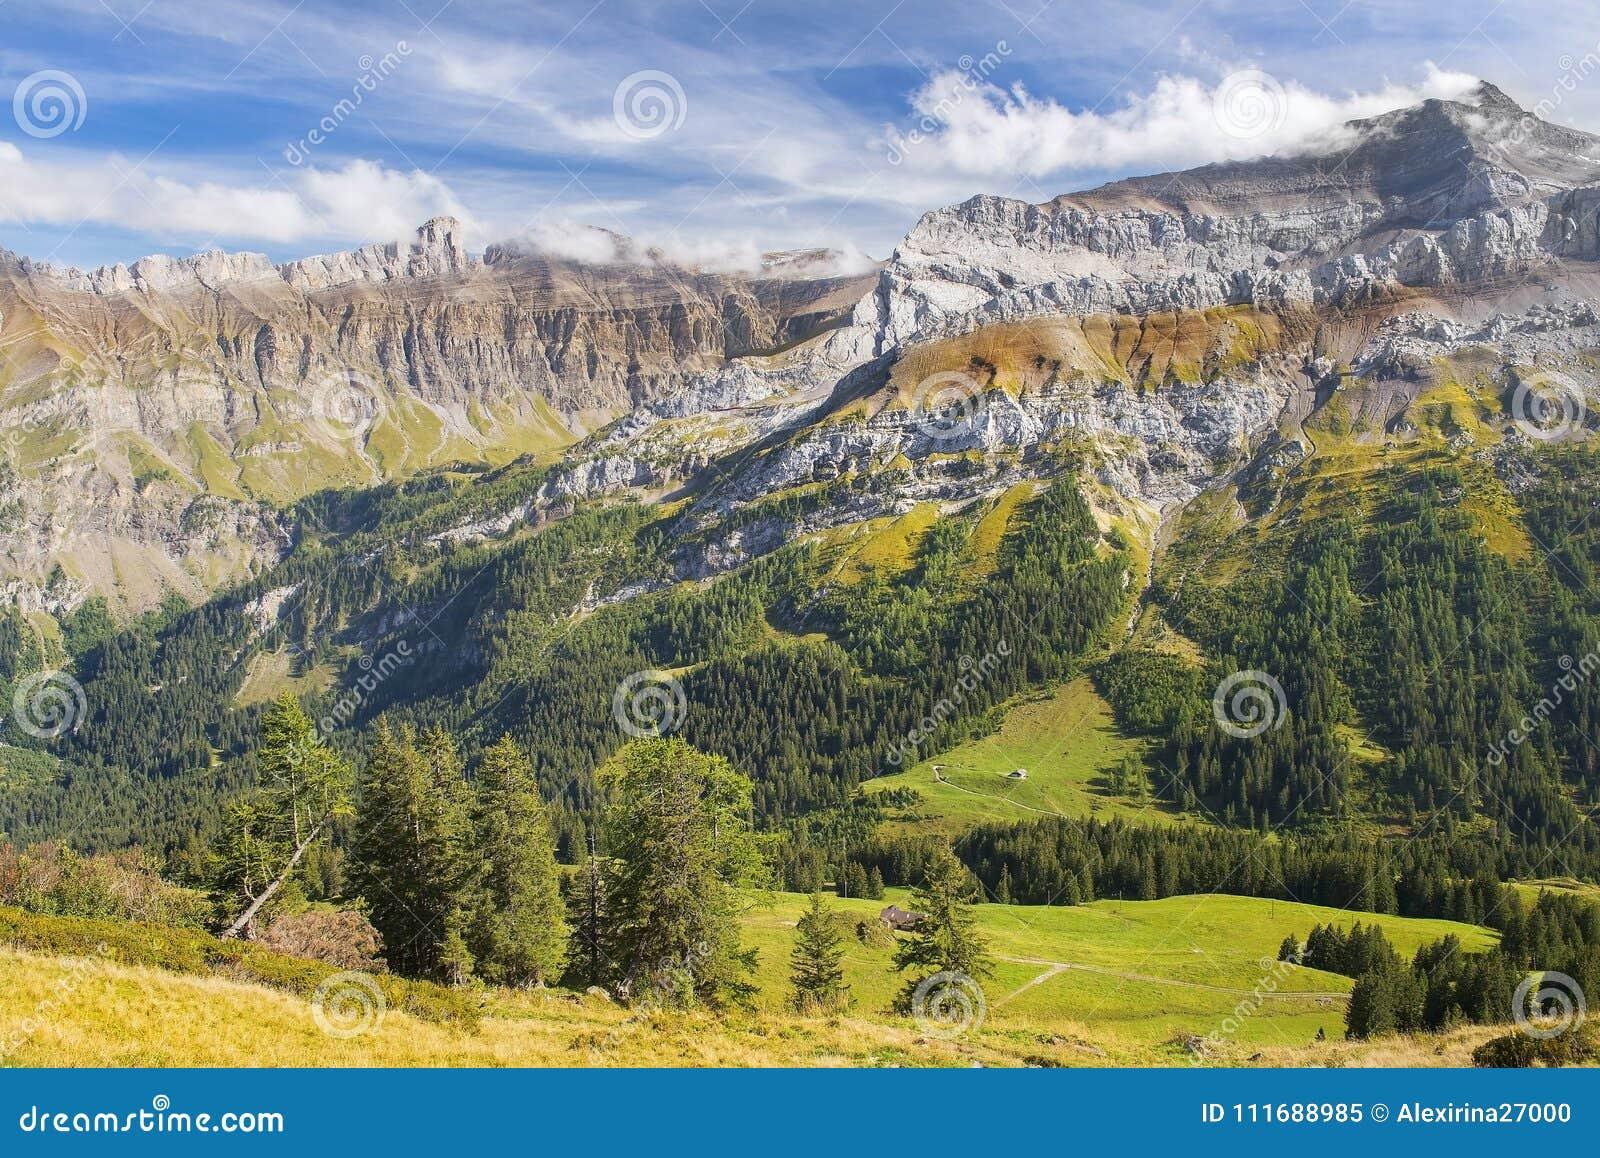 paysage magnifique de montagne en suisse image stock image du canton italie 111688985. Black Bedroom Furniture Sets. Home Design Ideas